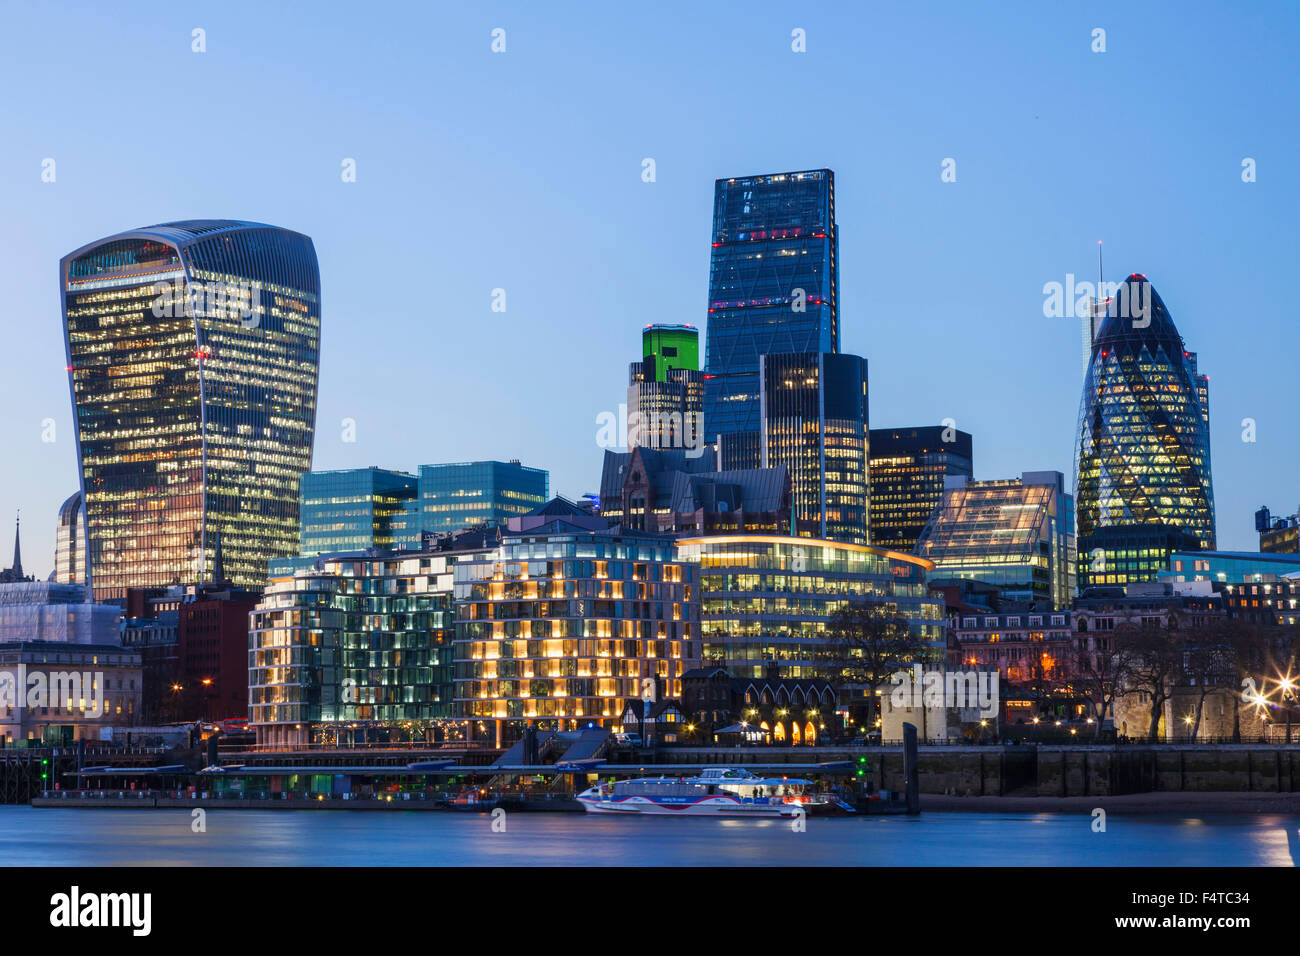 England, London, City, Skyline - Stock Image